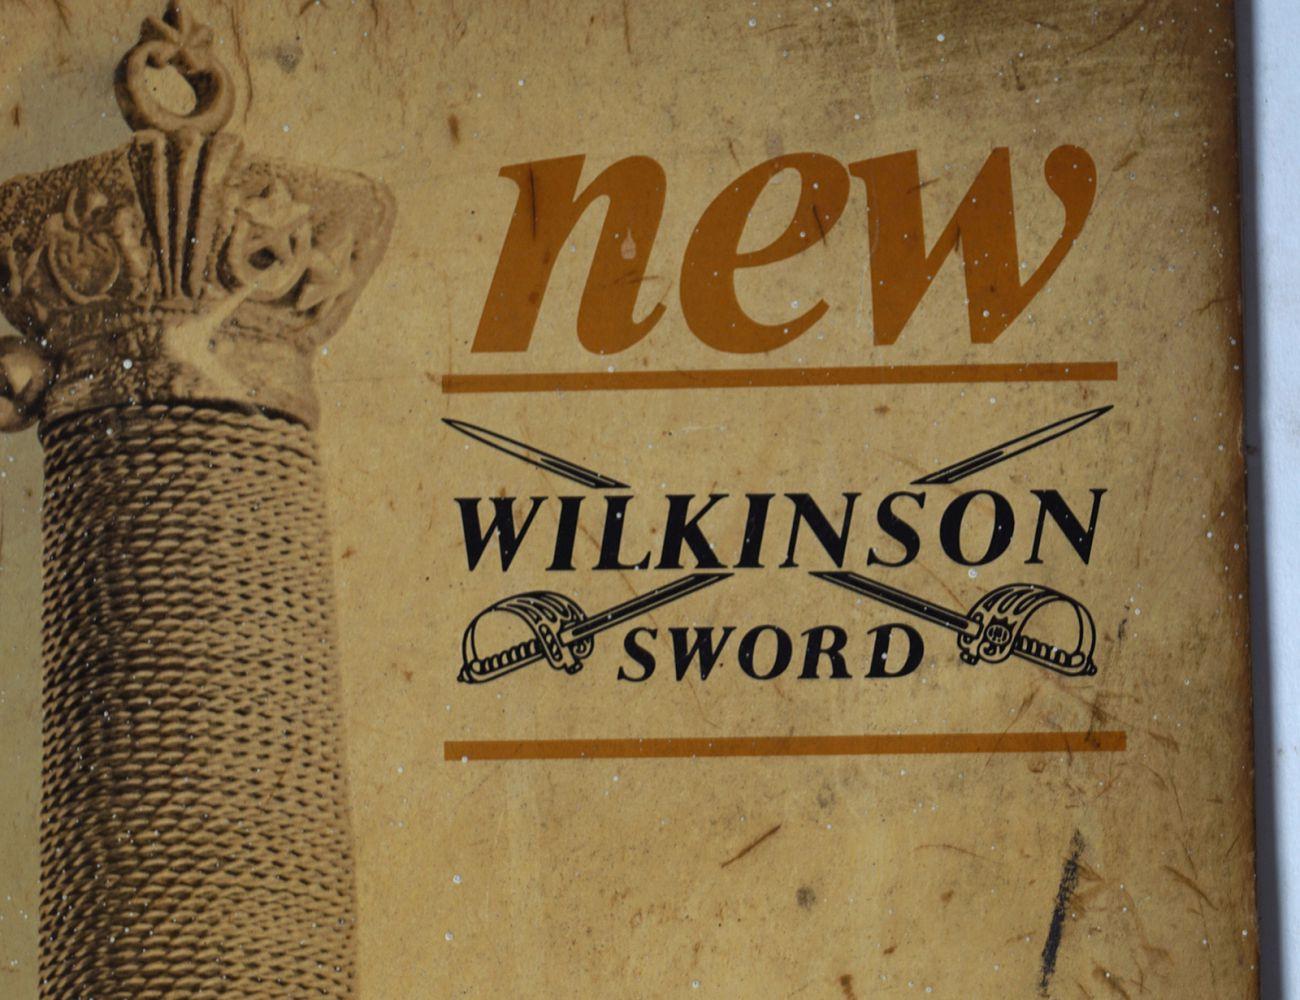 NEW WILKINSON SWORD ORIGINAL POSTER - Image 2 of 4